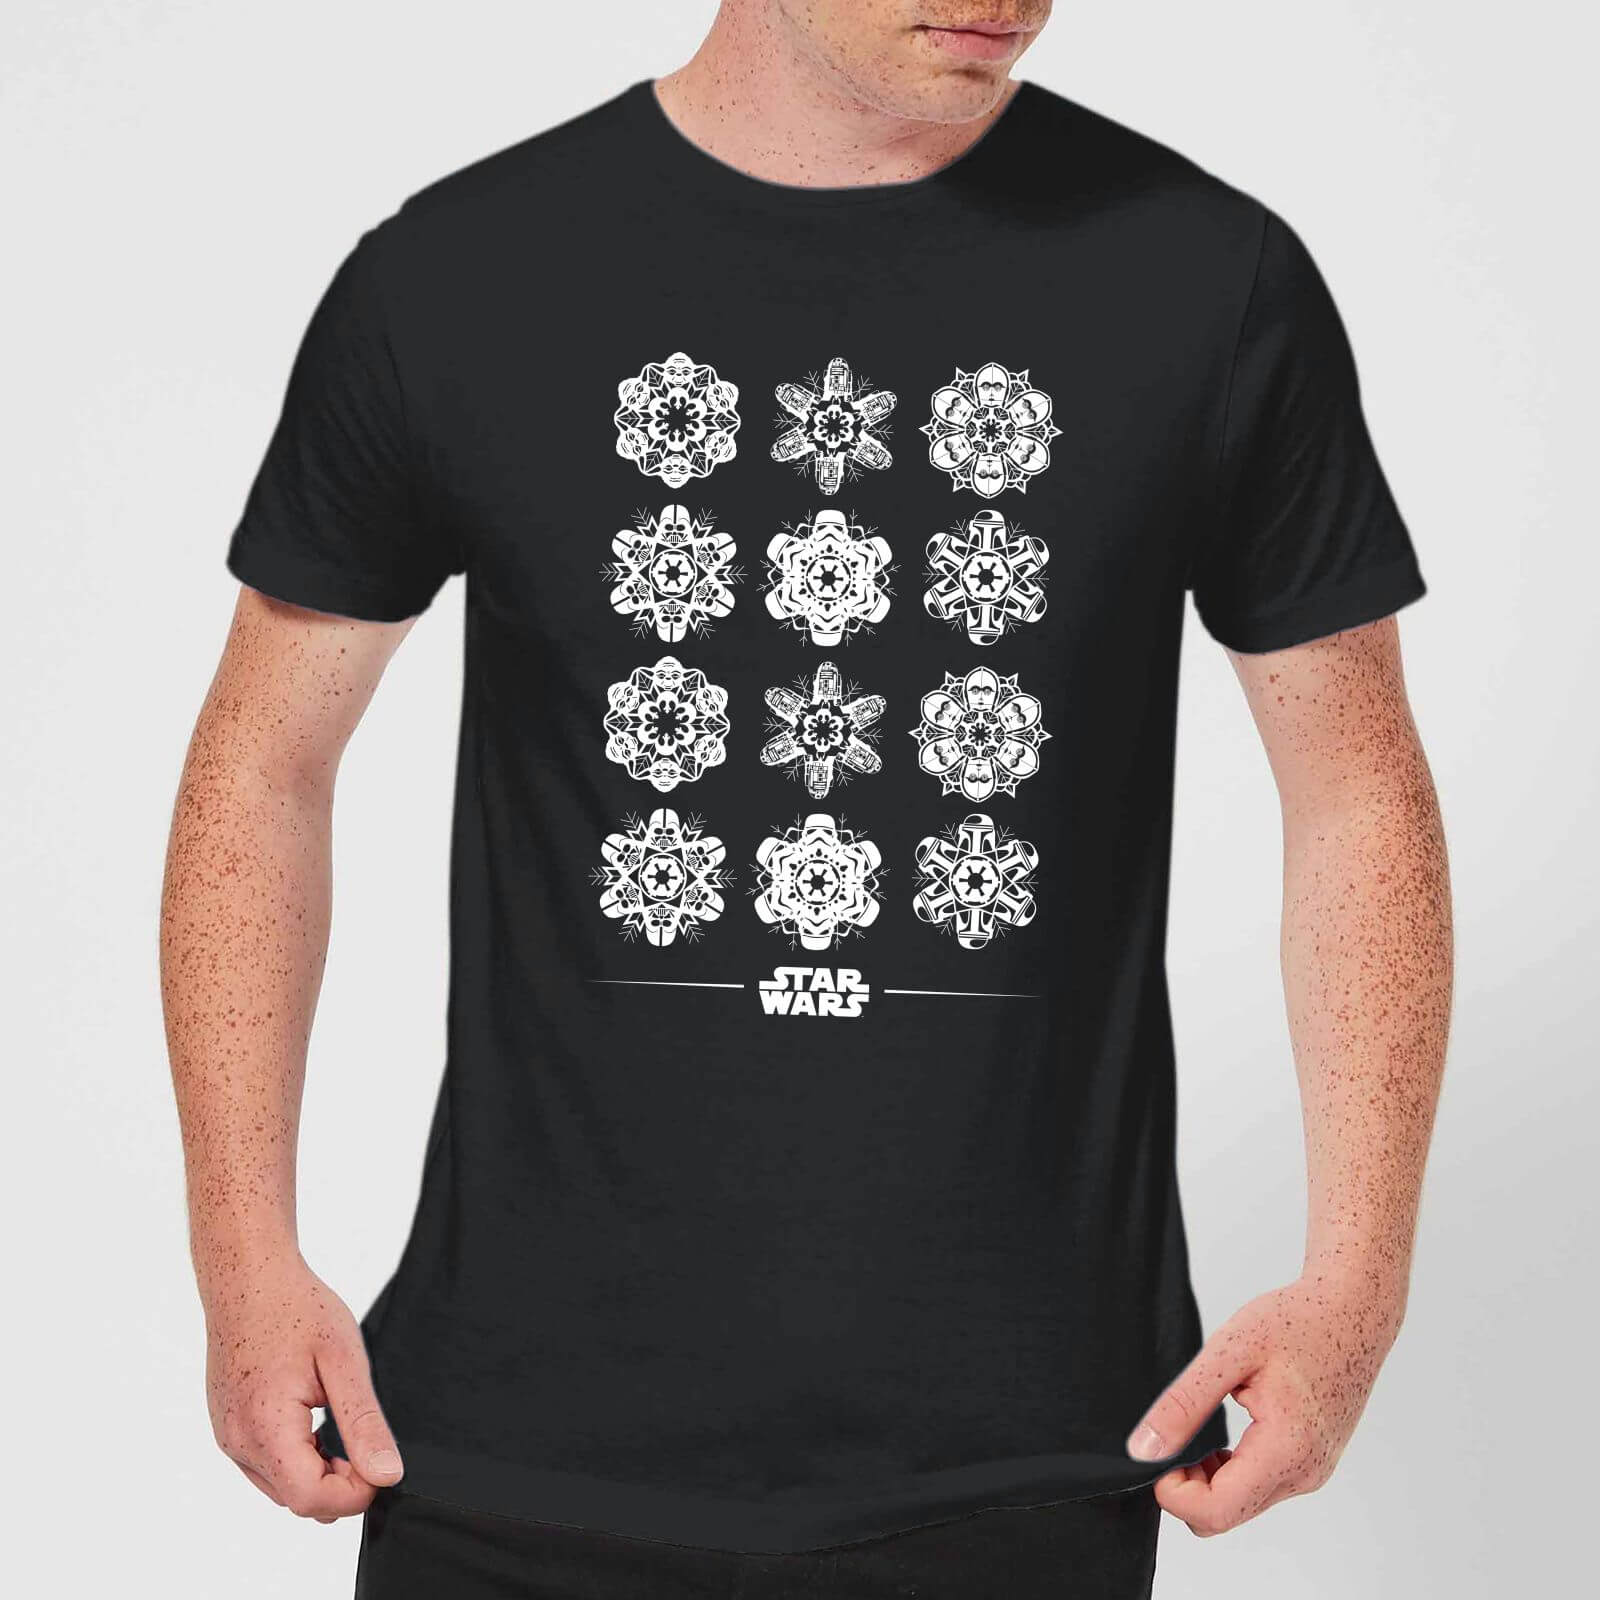 Star Wars Snowflake Men's Christmas T-Shirt - Black - 3XL - Black